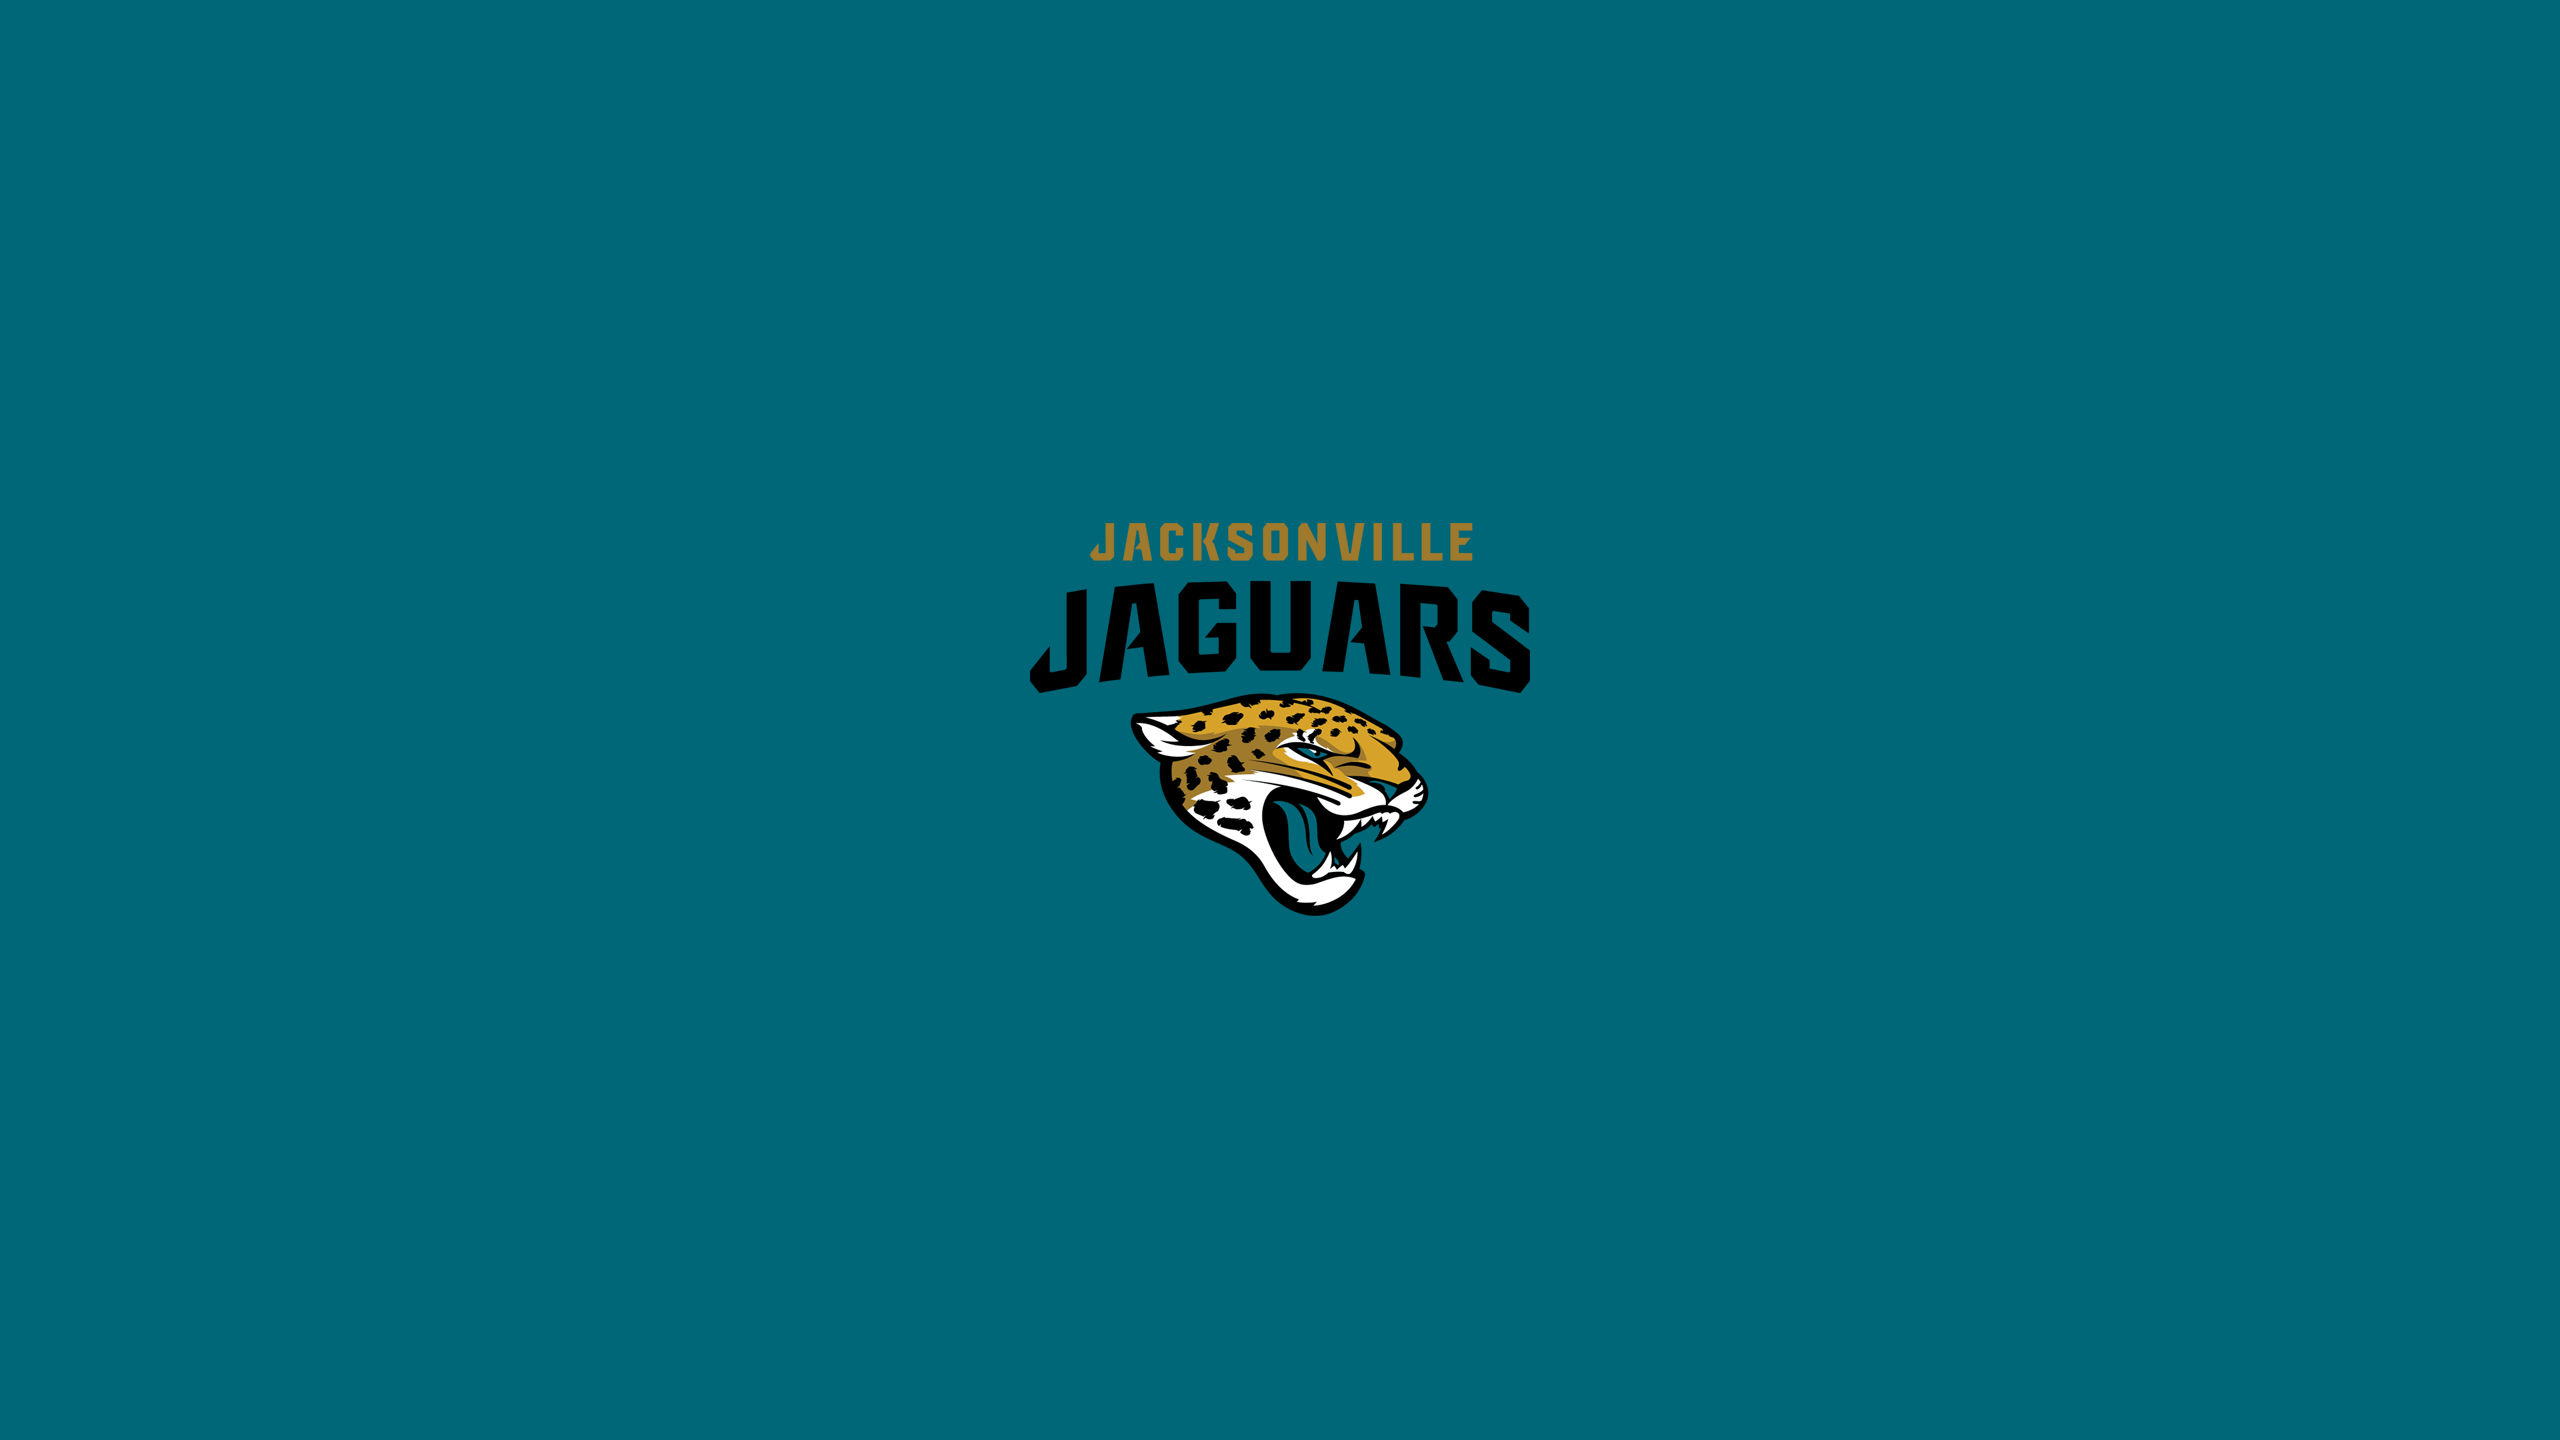 Jacksonville Jaguars Wallpaper Image Group 35 2560x1440